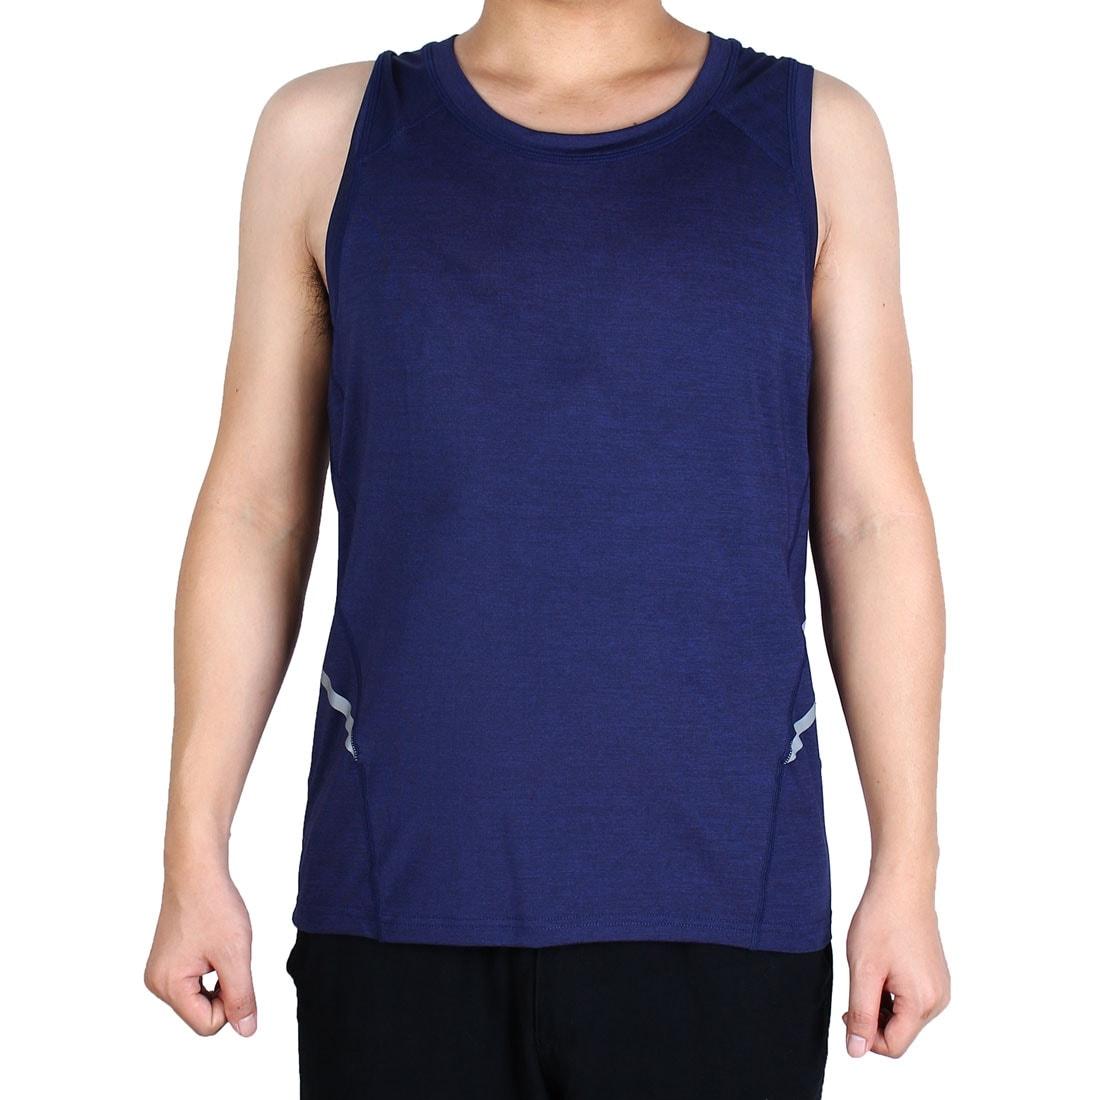 CoreX Training Vest Maroon Men/'s Sleeveless T Shirt